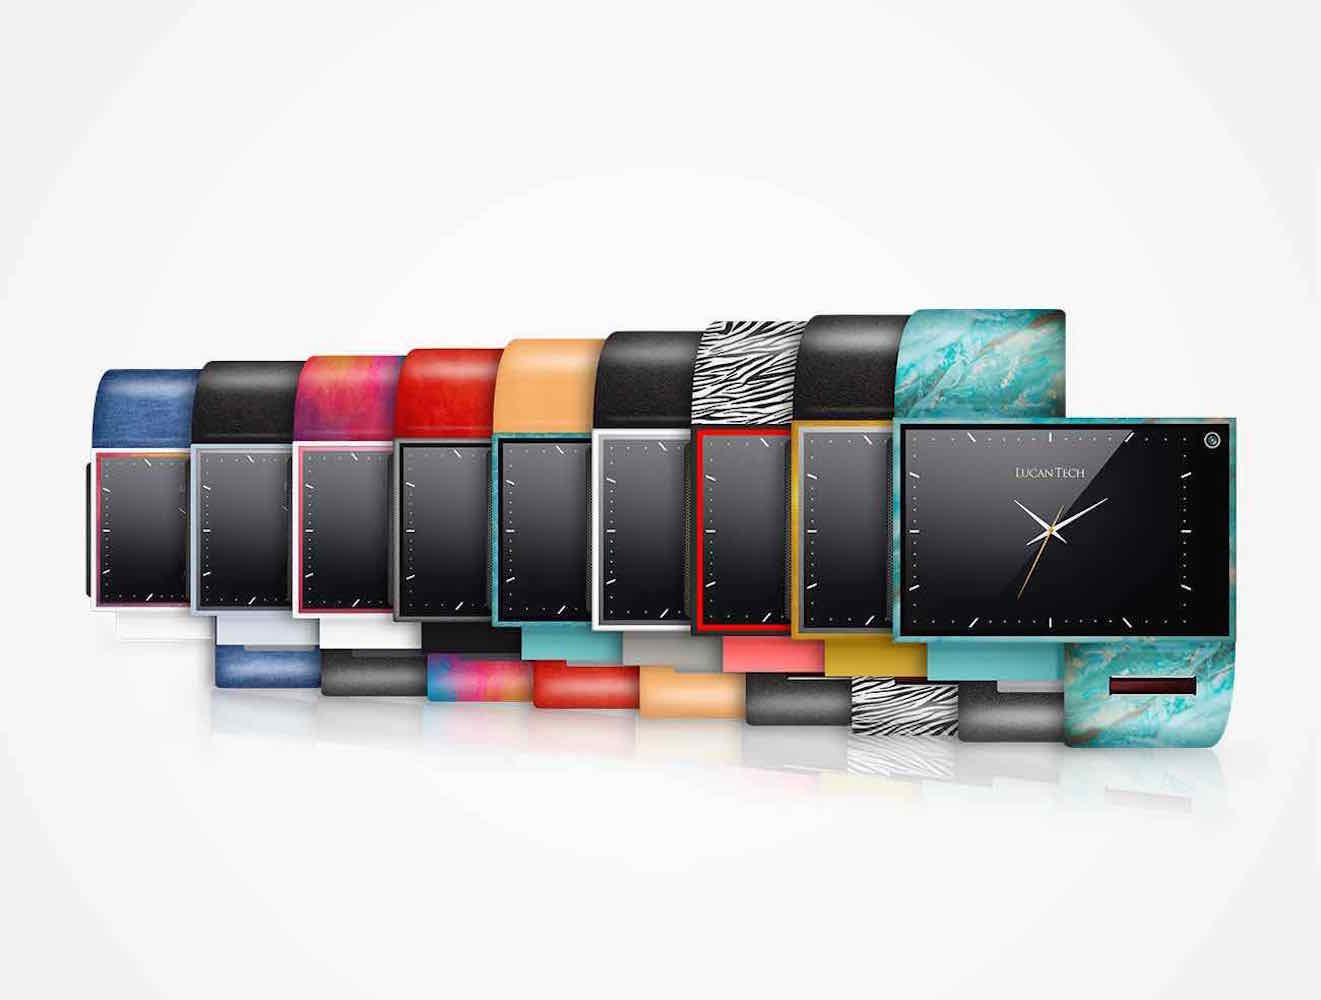 chameleon-modular-cellular-smartwatch-07